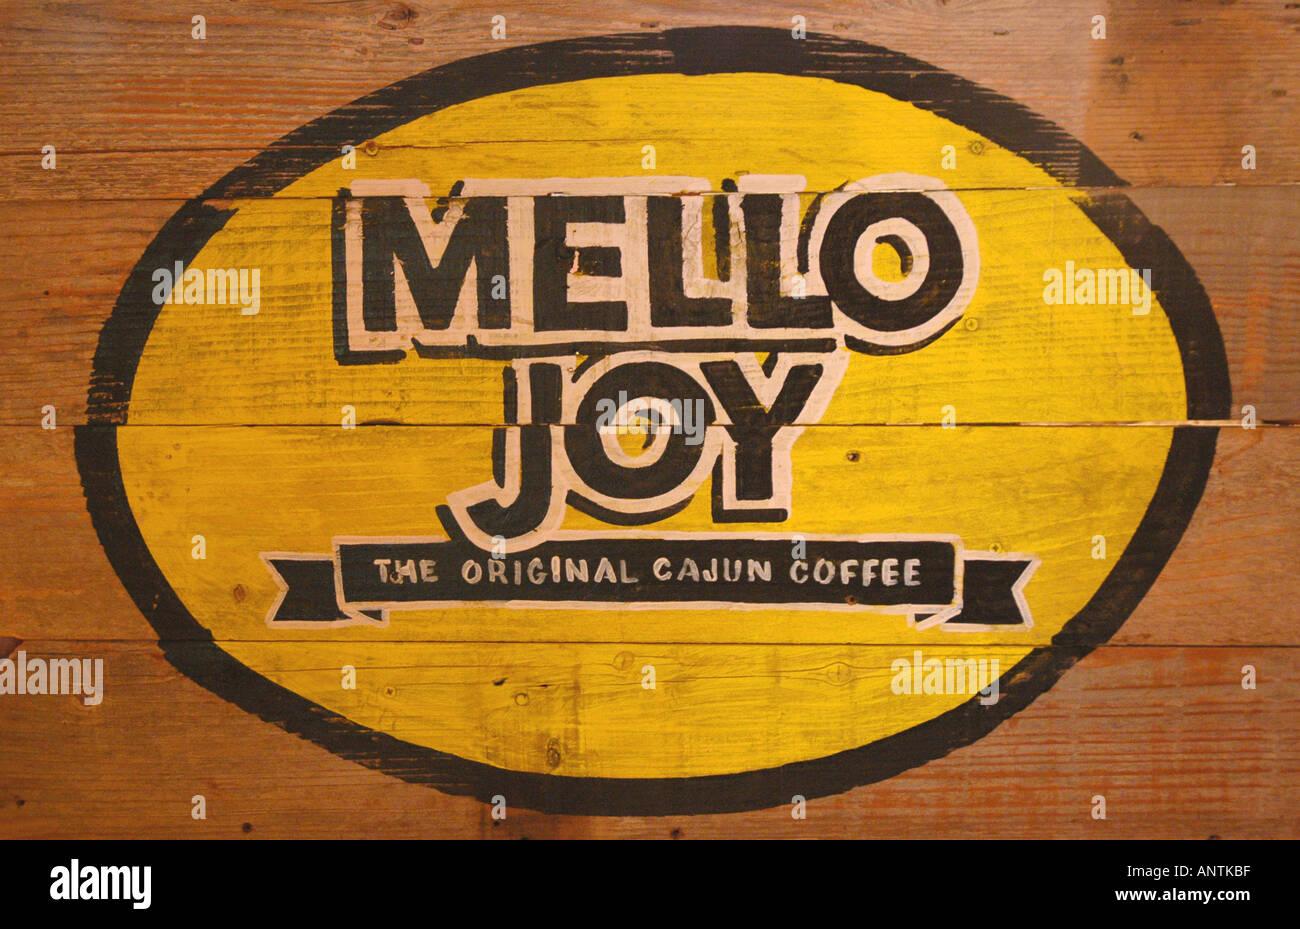 Louisiana la Lafayette cajun country cooking cuisine acadiana mello joy the original cajun coffee wooden sign - Stock Image